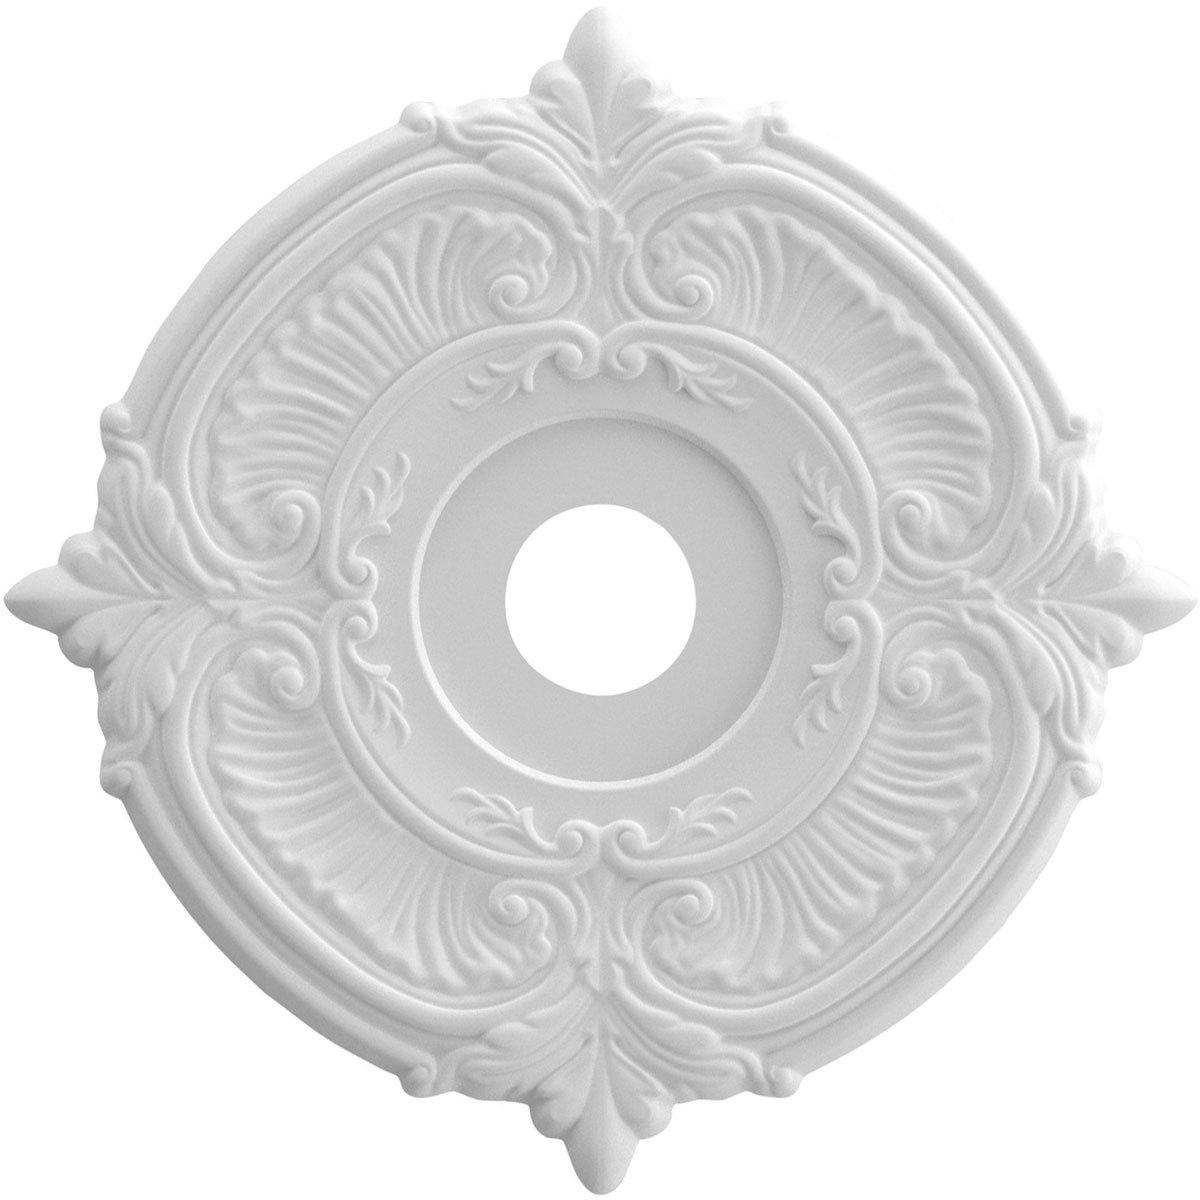 Ekena Millwork CMP22AT Attica Medallion Thermoformed PVC Ceiling, 22'' OD x 3 1/2'' ID x 1'' P, White